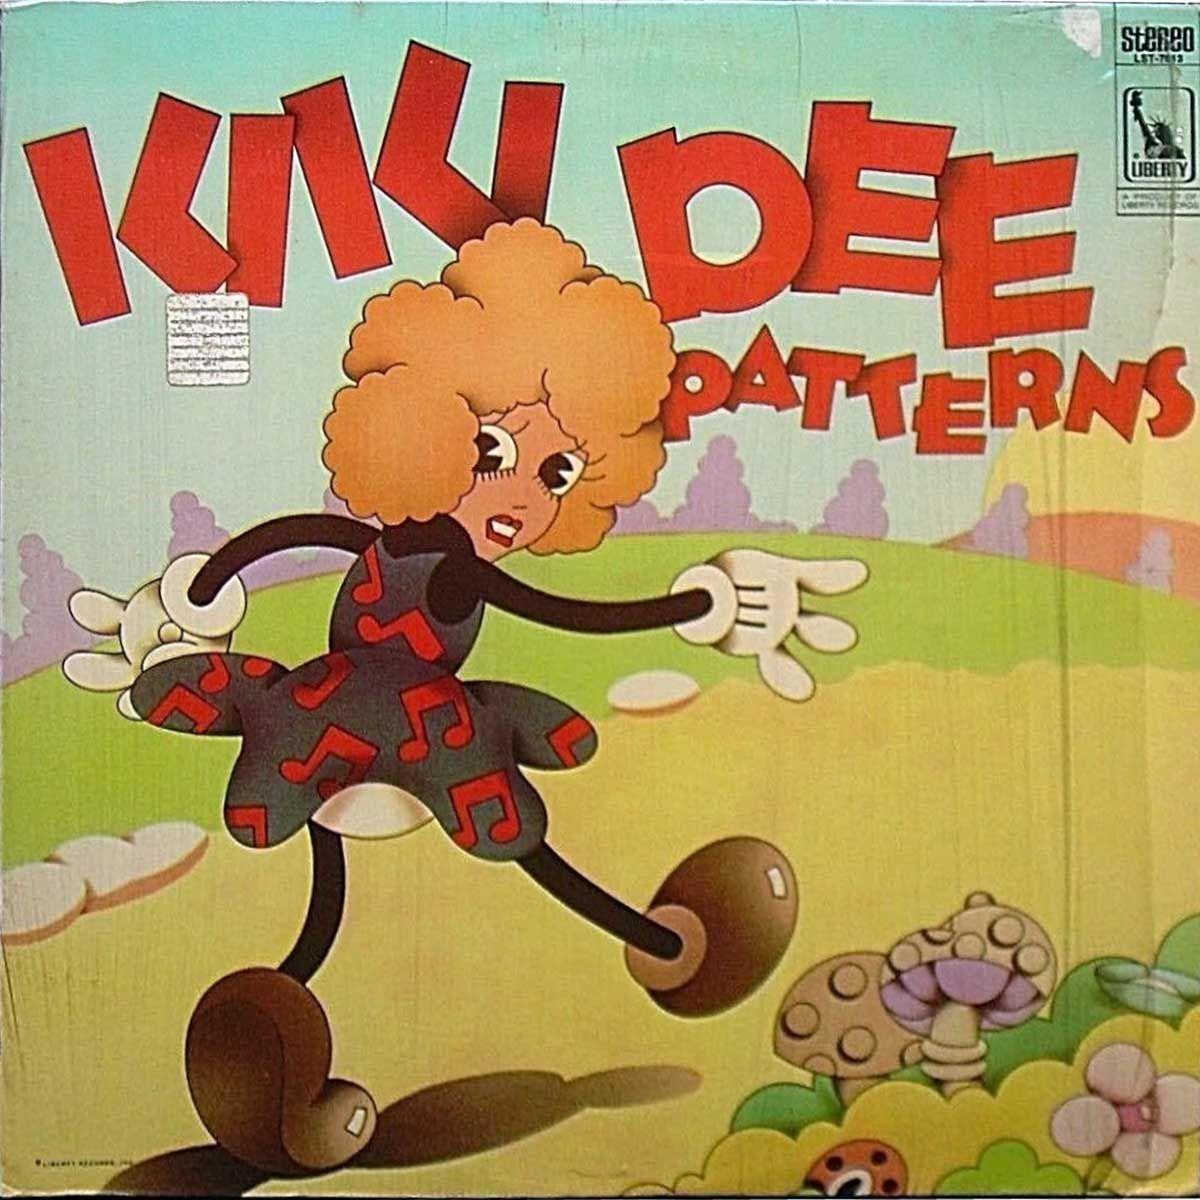 Kiki Dee - Patterns (Liberty Records